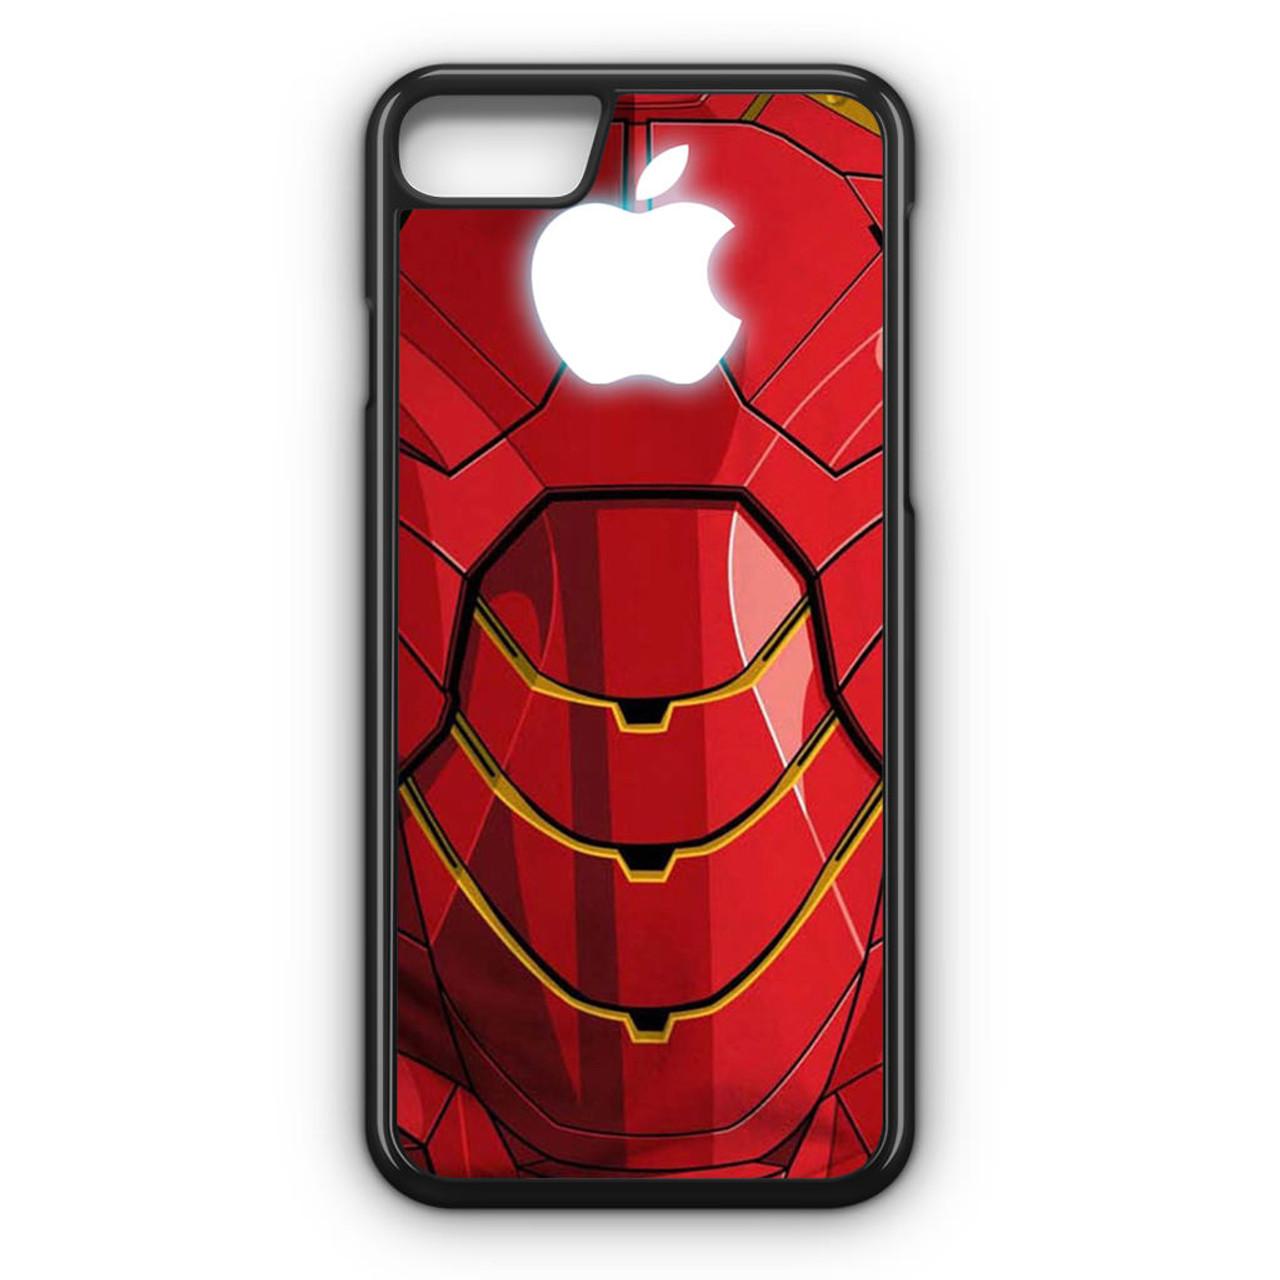 new styles a0575 d77b2 Iron man apple logo iPhone 7 Case